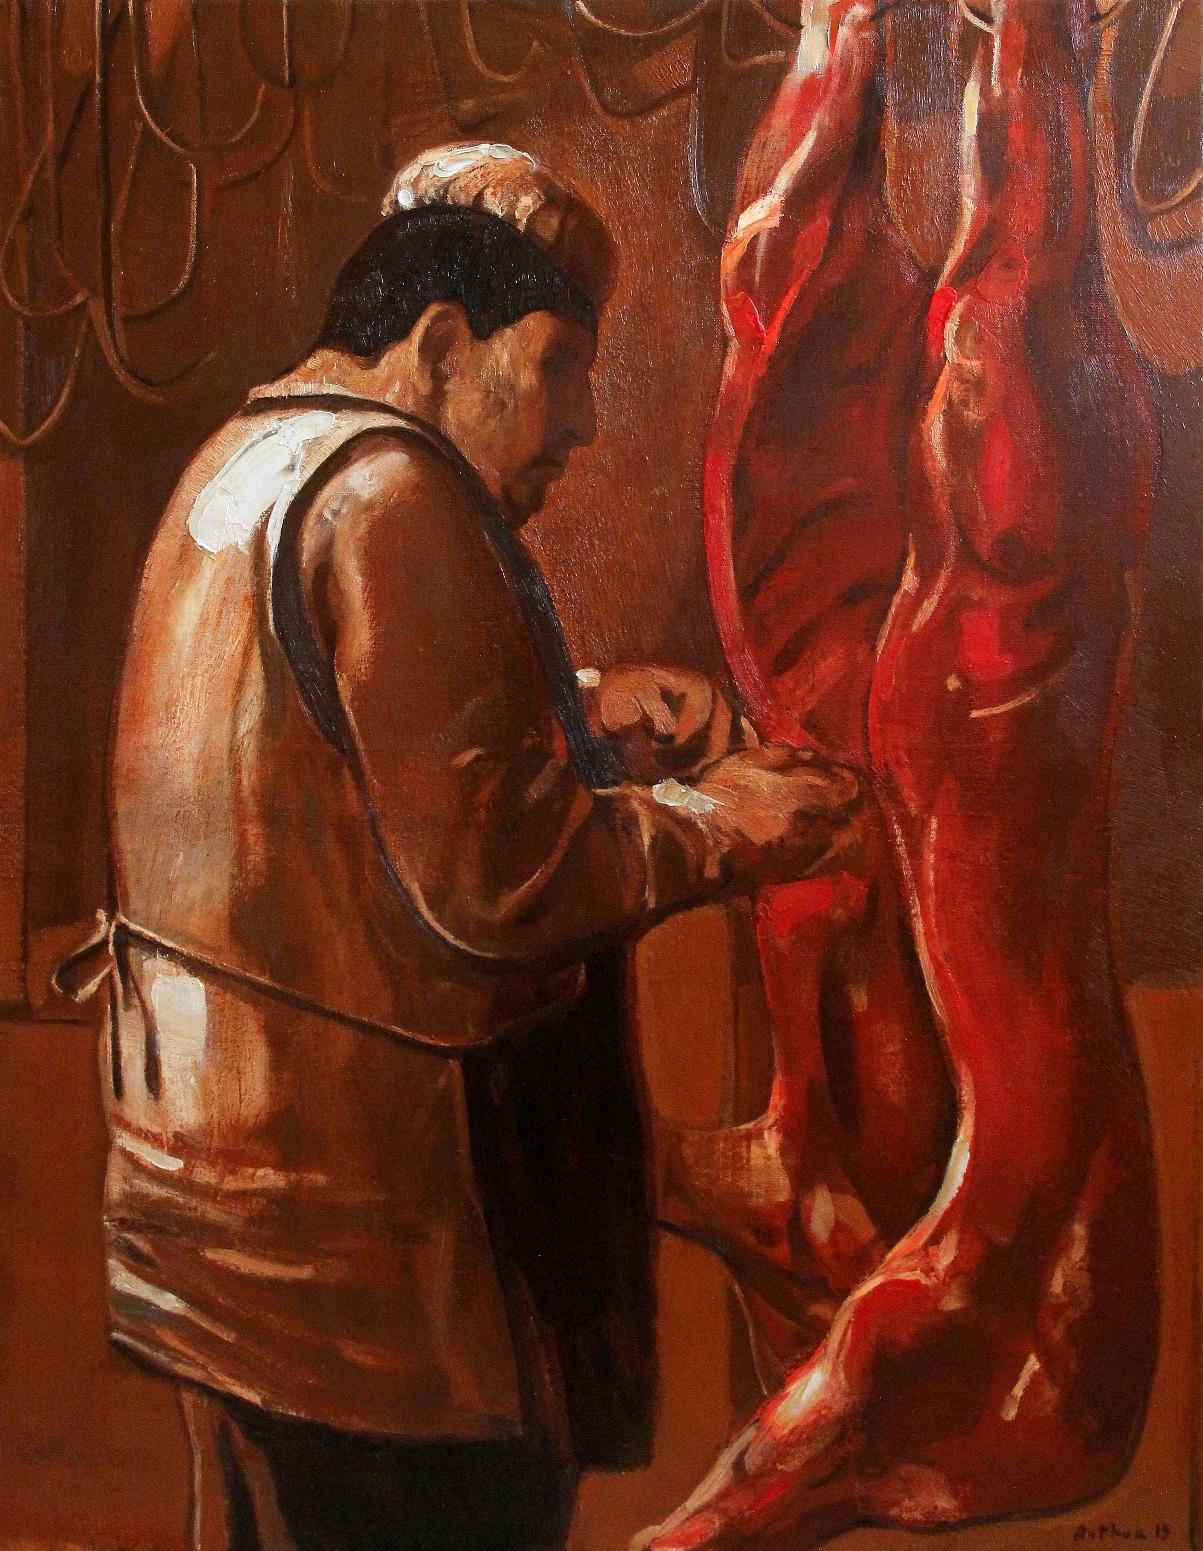 ''Butcher'' 2019, Oil on canvas, 90x70 cm